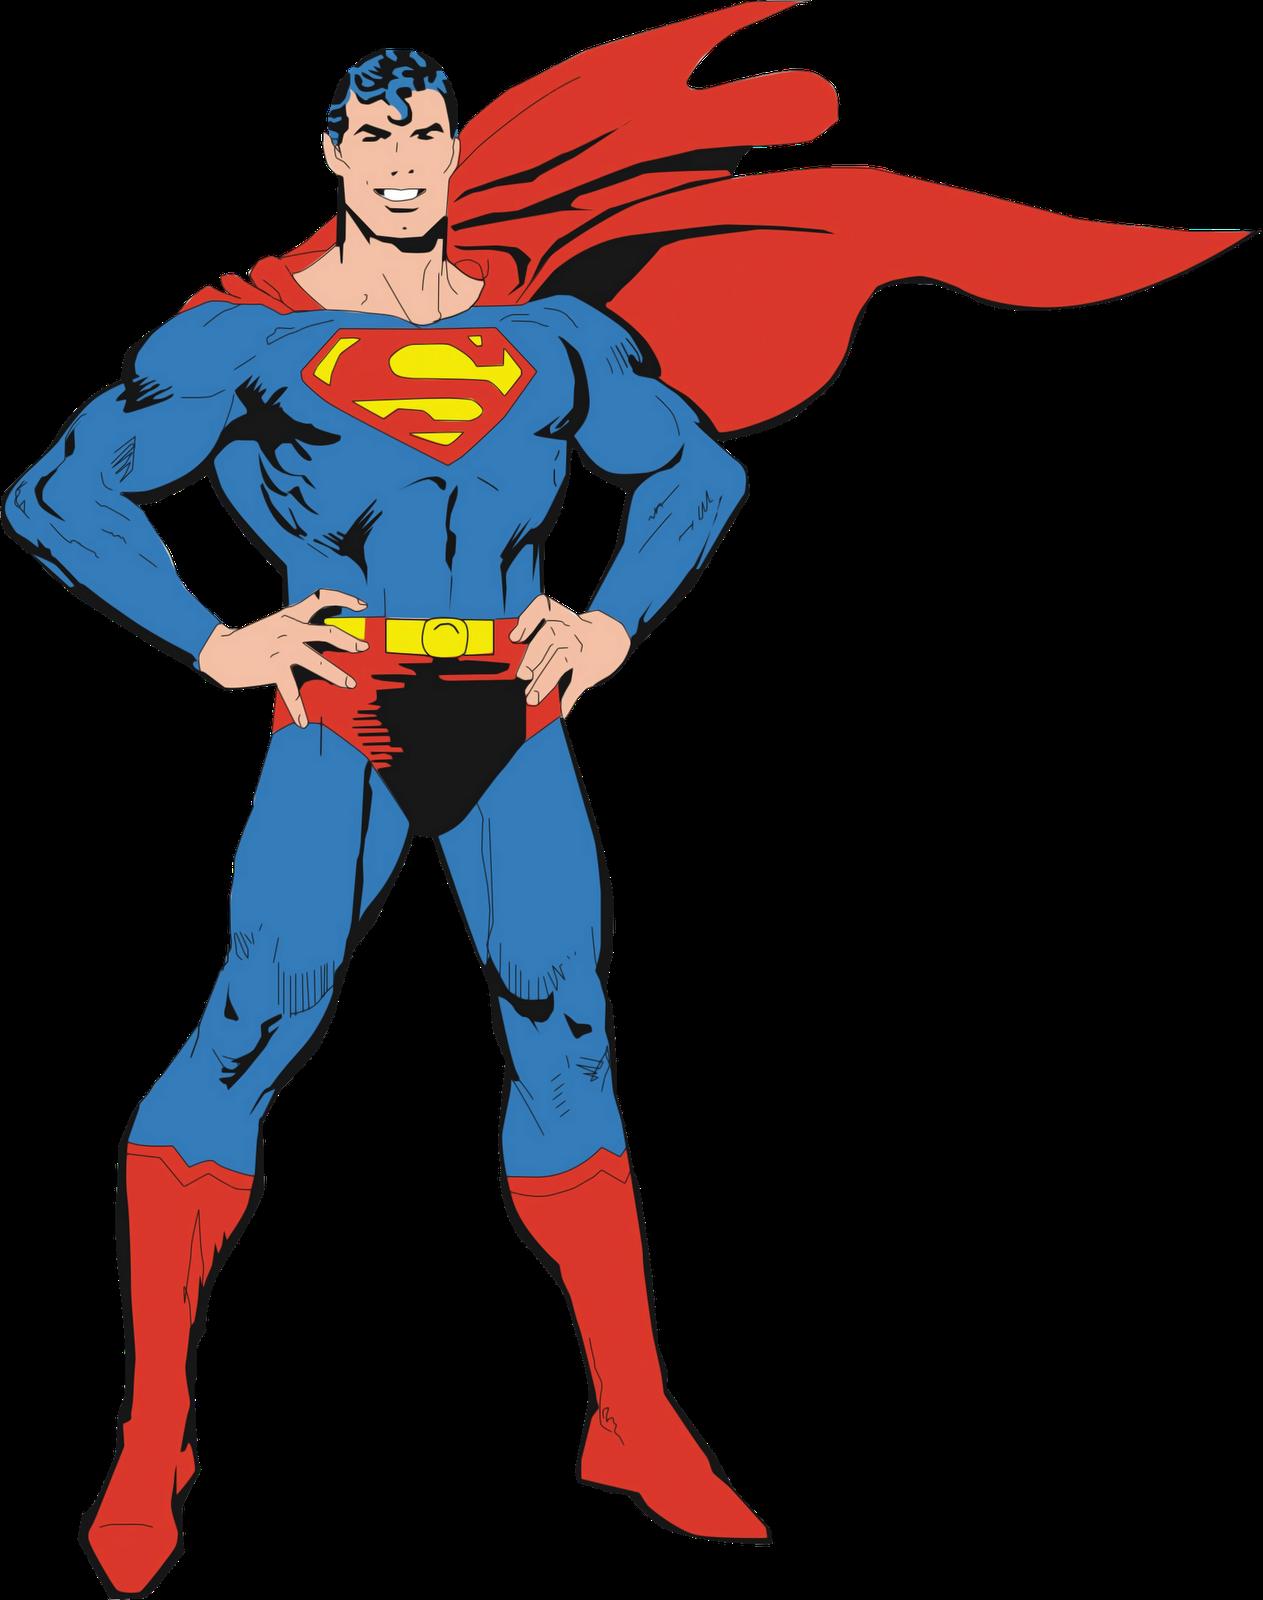 Superman PNG Image